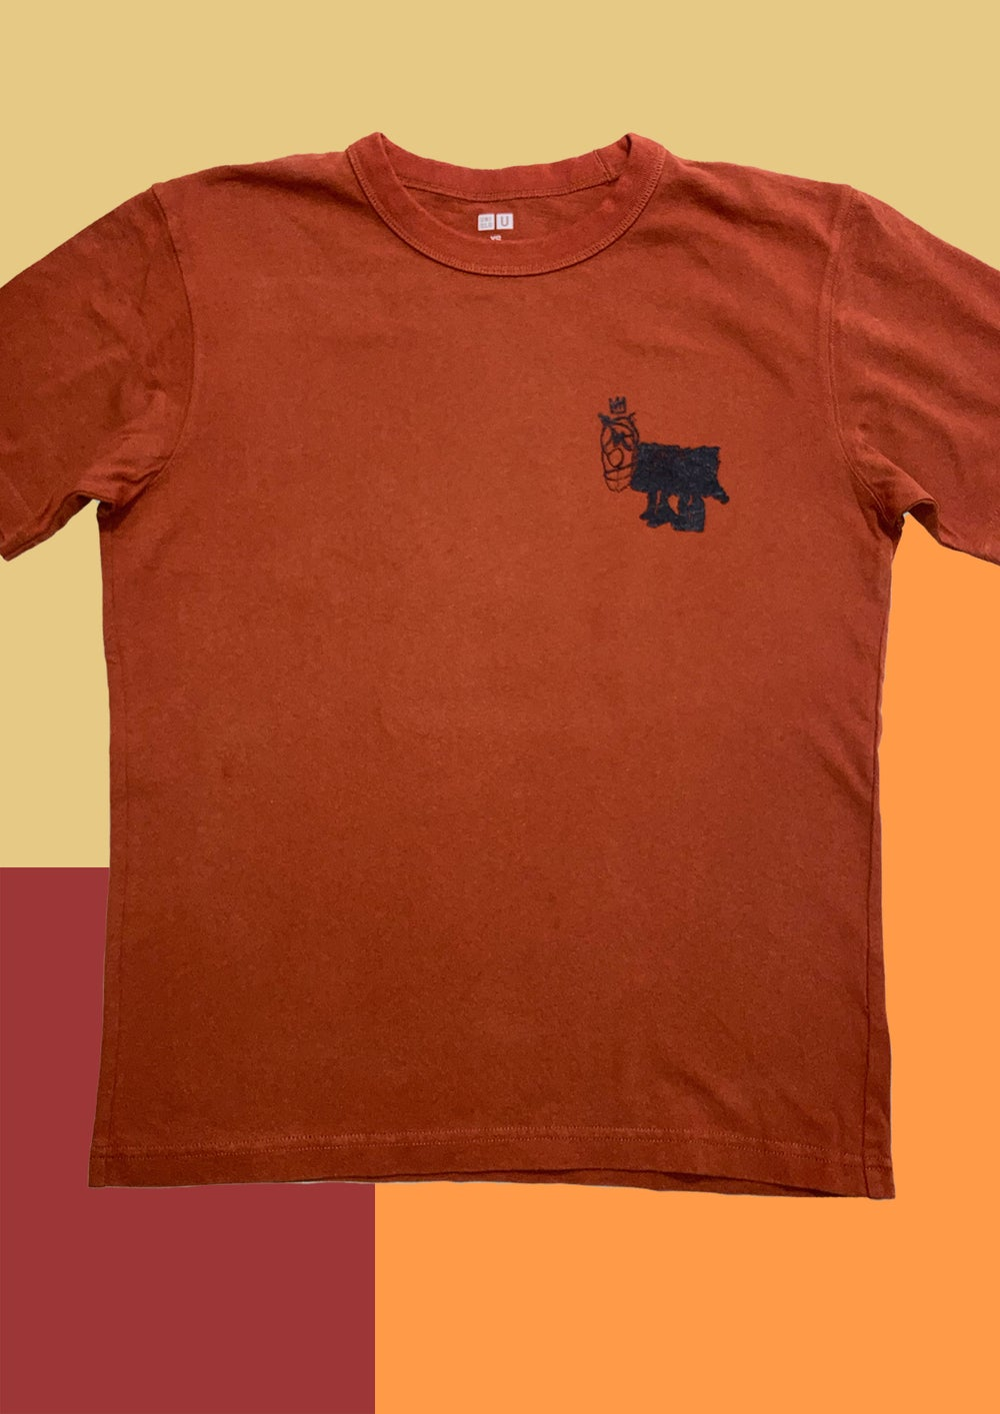 Blacksheep x xNever conform Classic logo shirt